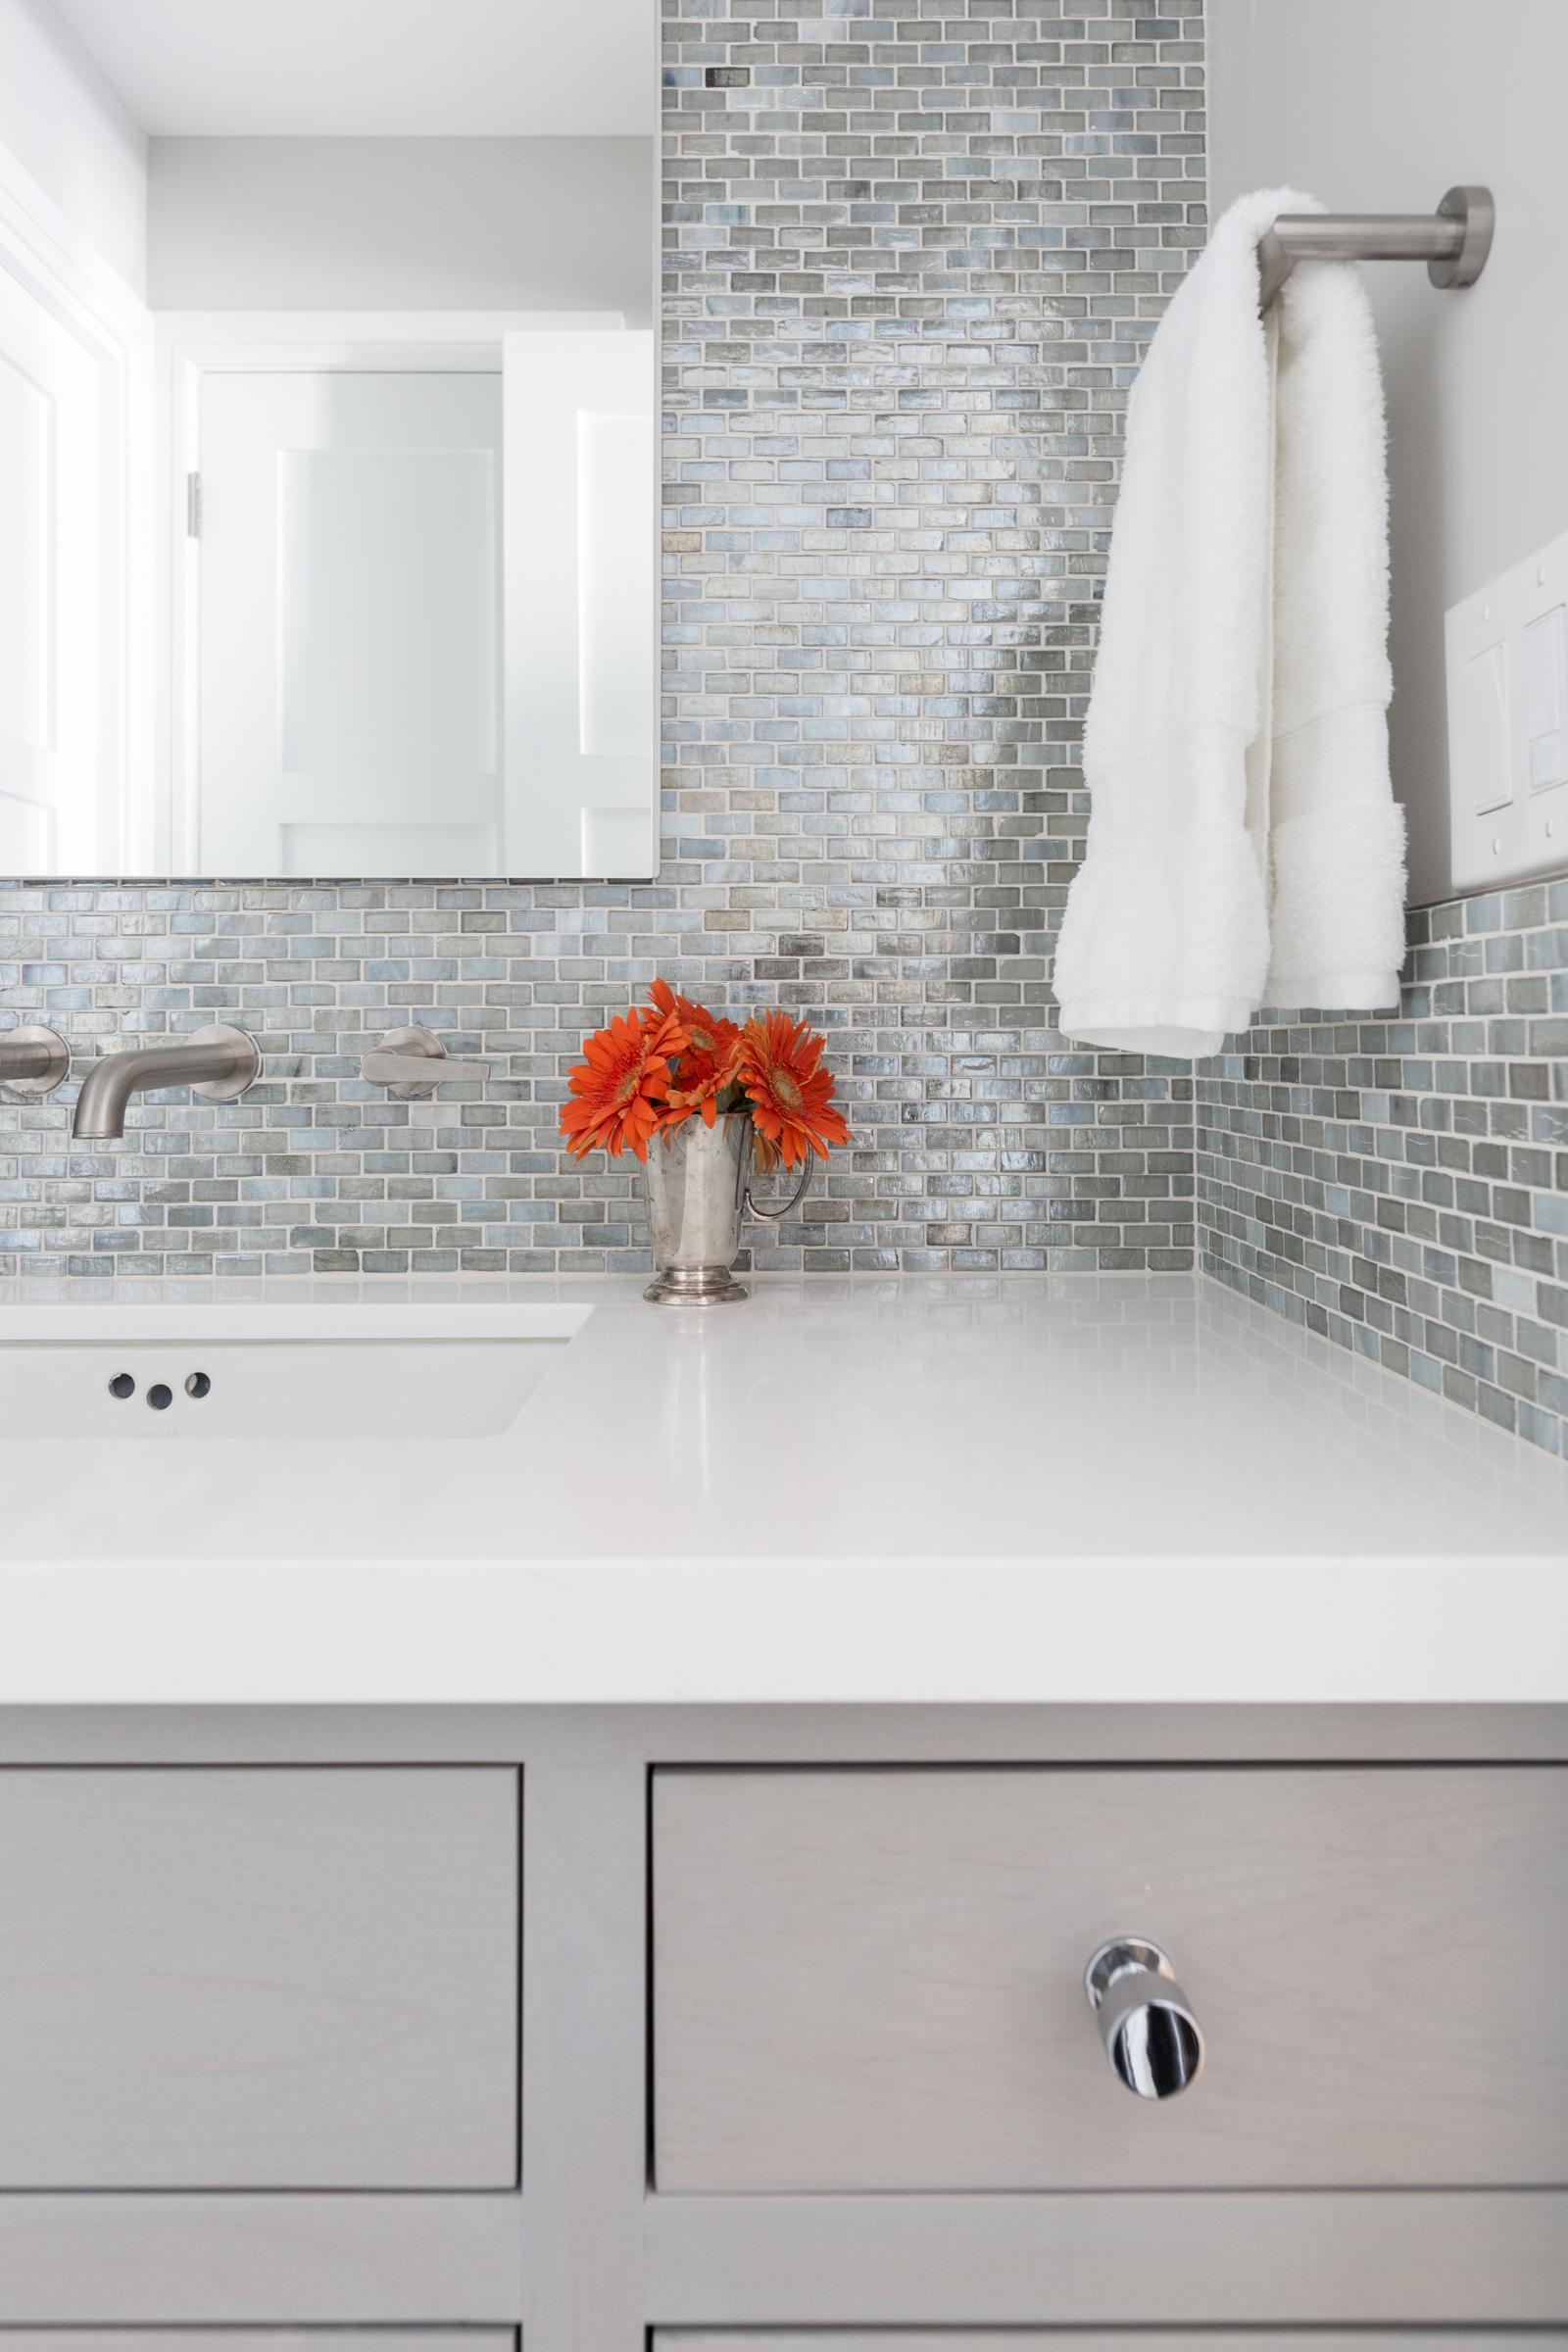 celeste_bathroom-5.jpg